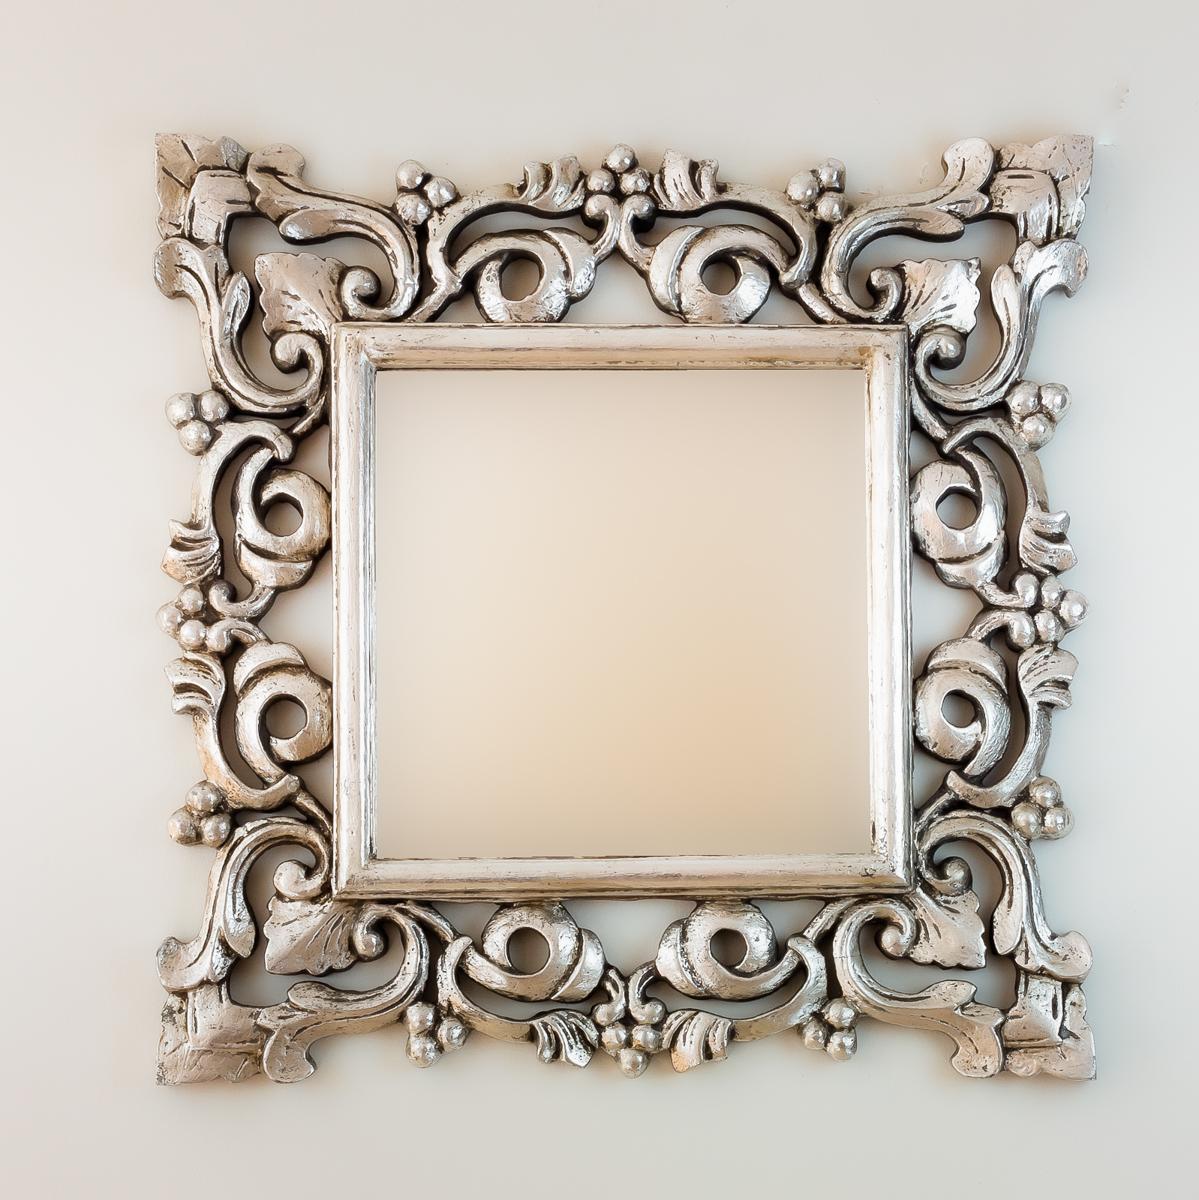 Espejo de pared en madera gada warta plata envejecida for Espejo madera envejecida